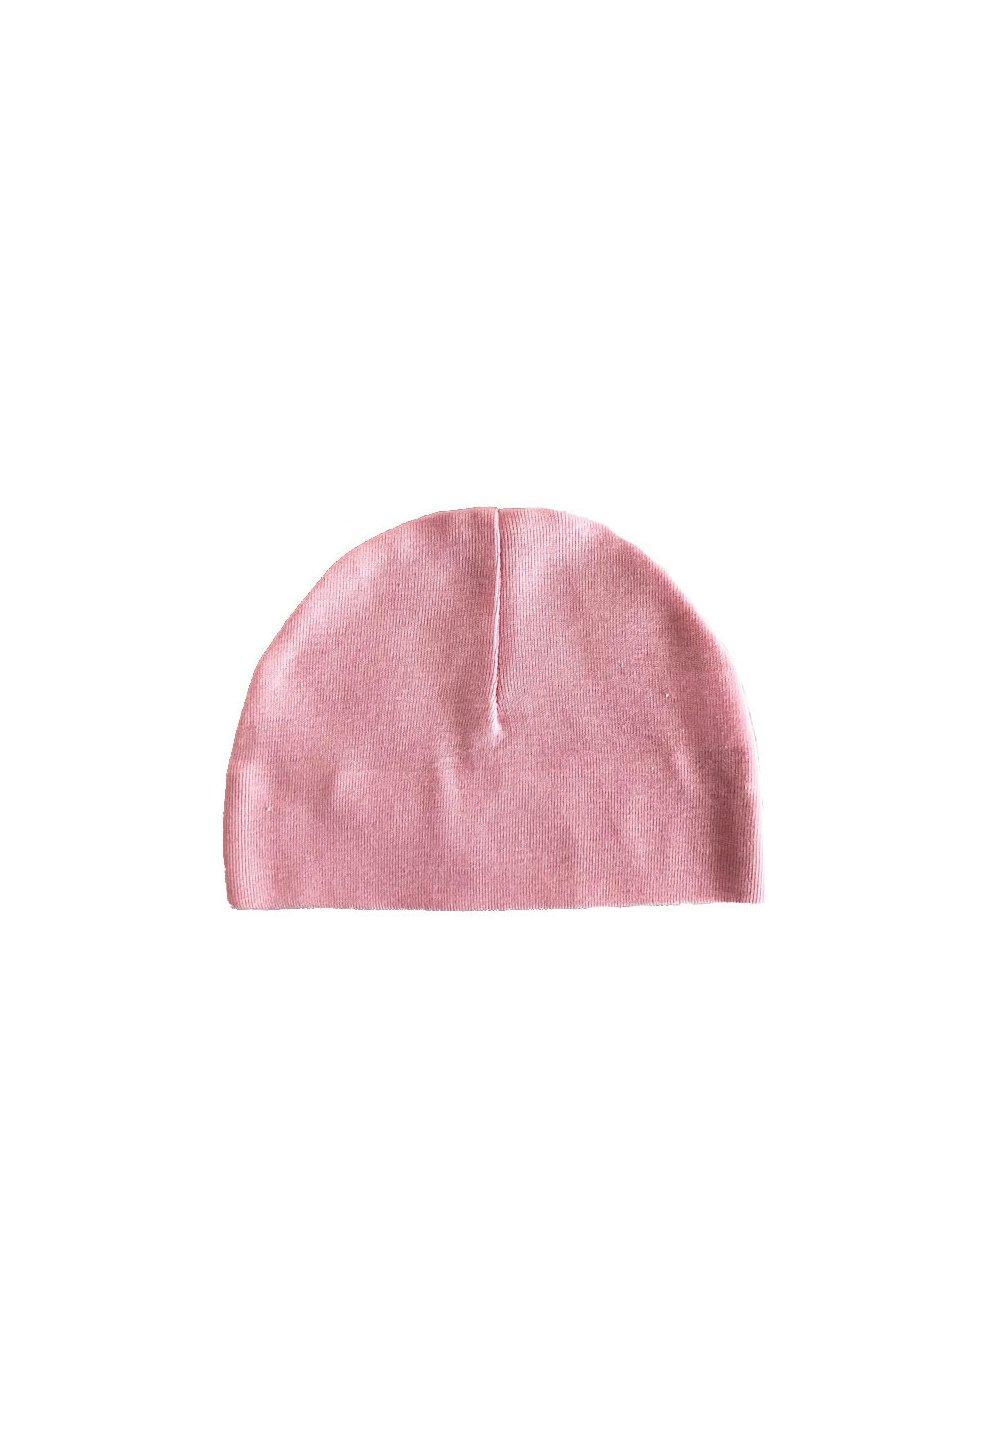 Fes interior roz deschis imagine